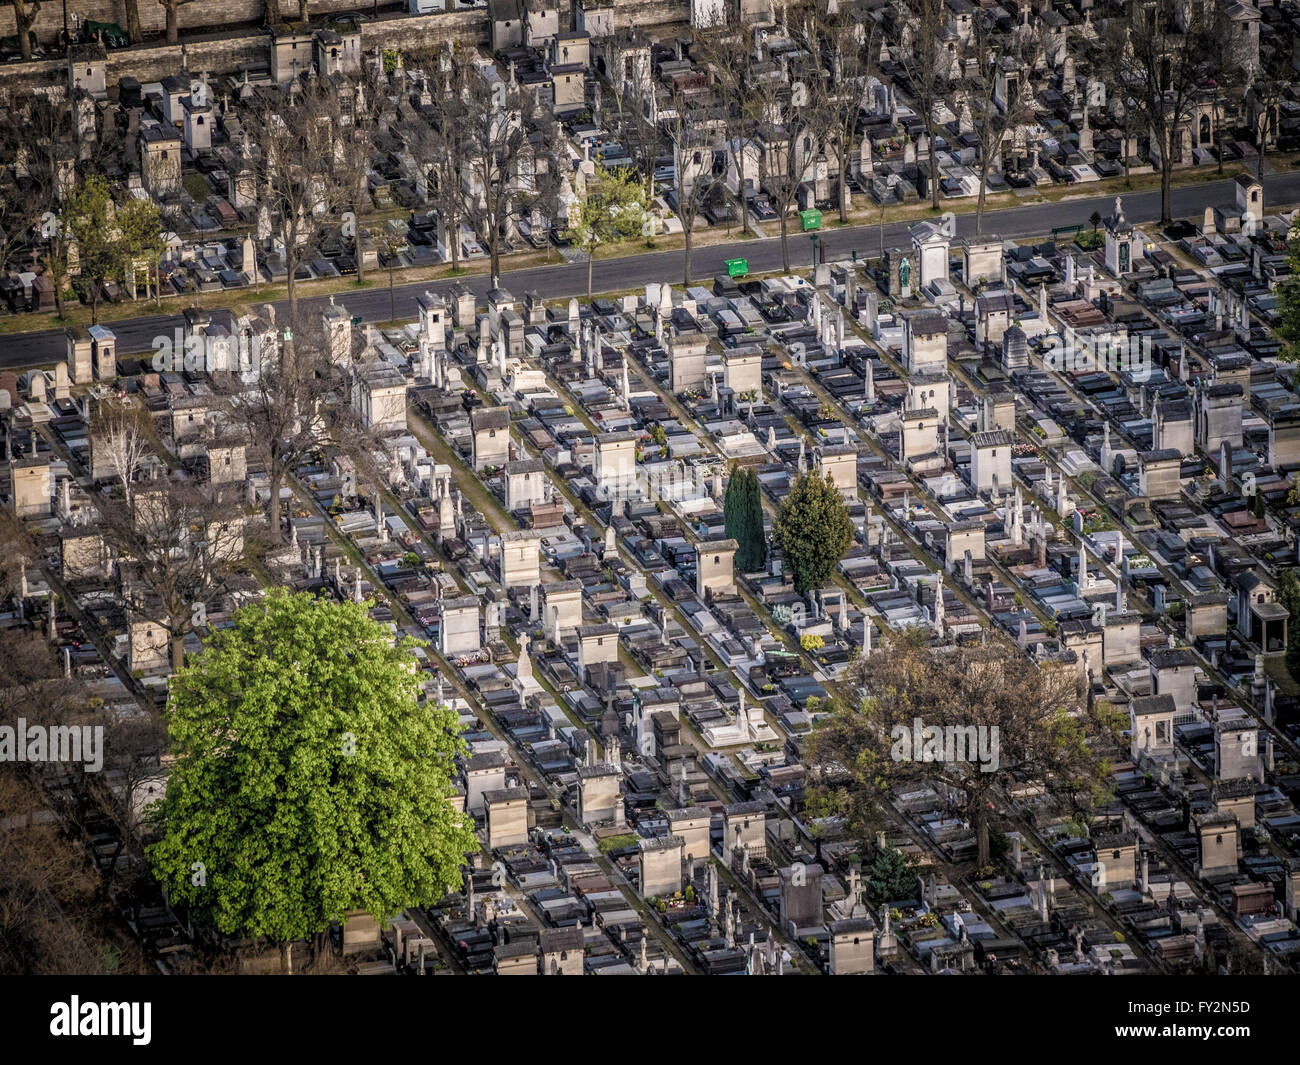 Montparnasse cemetery, Paris, France. - Stock Image